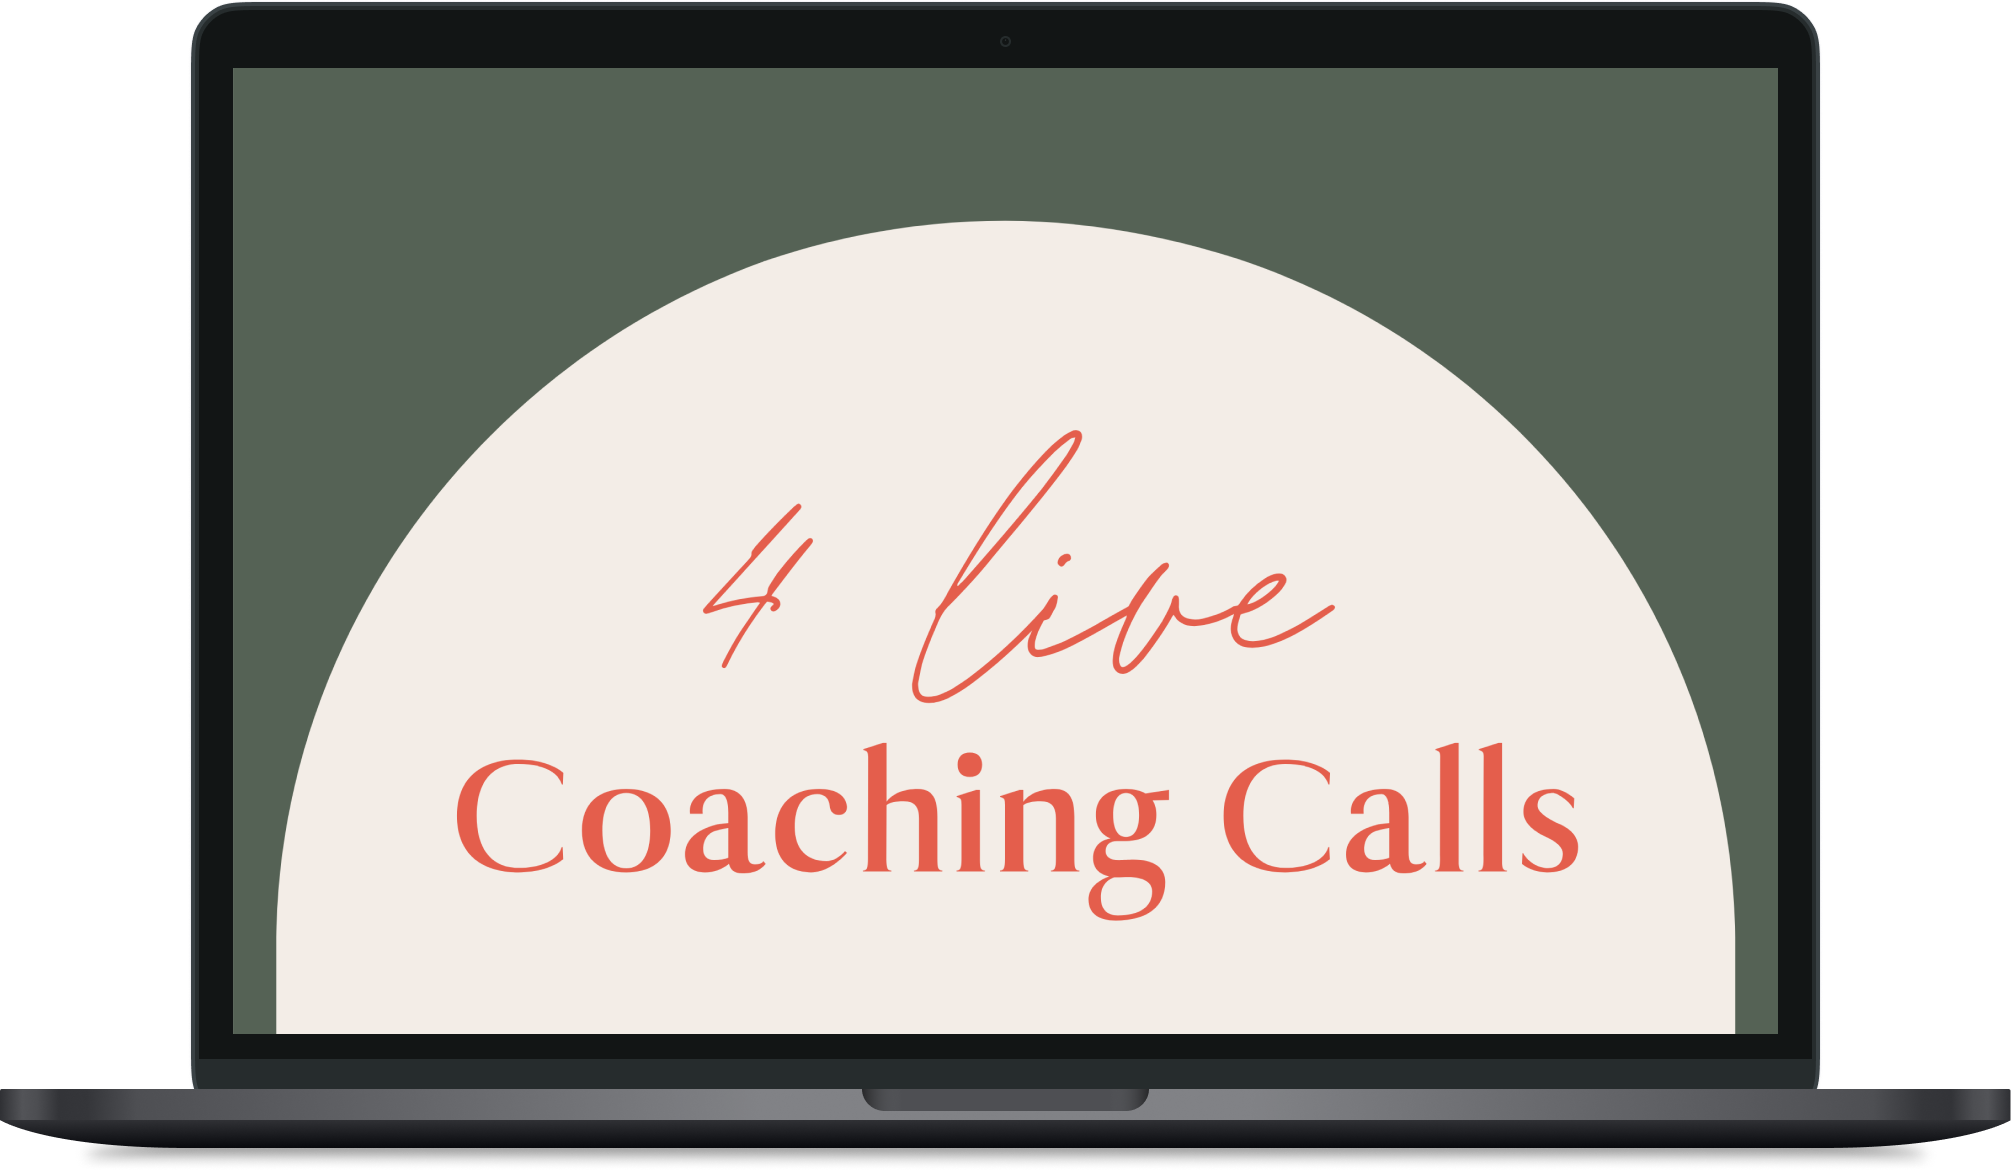 Live Coaching Calls